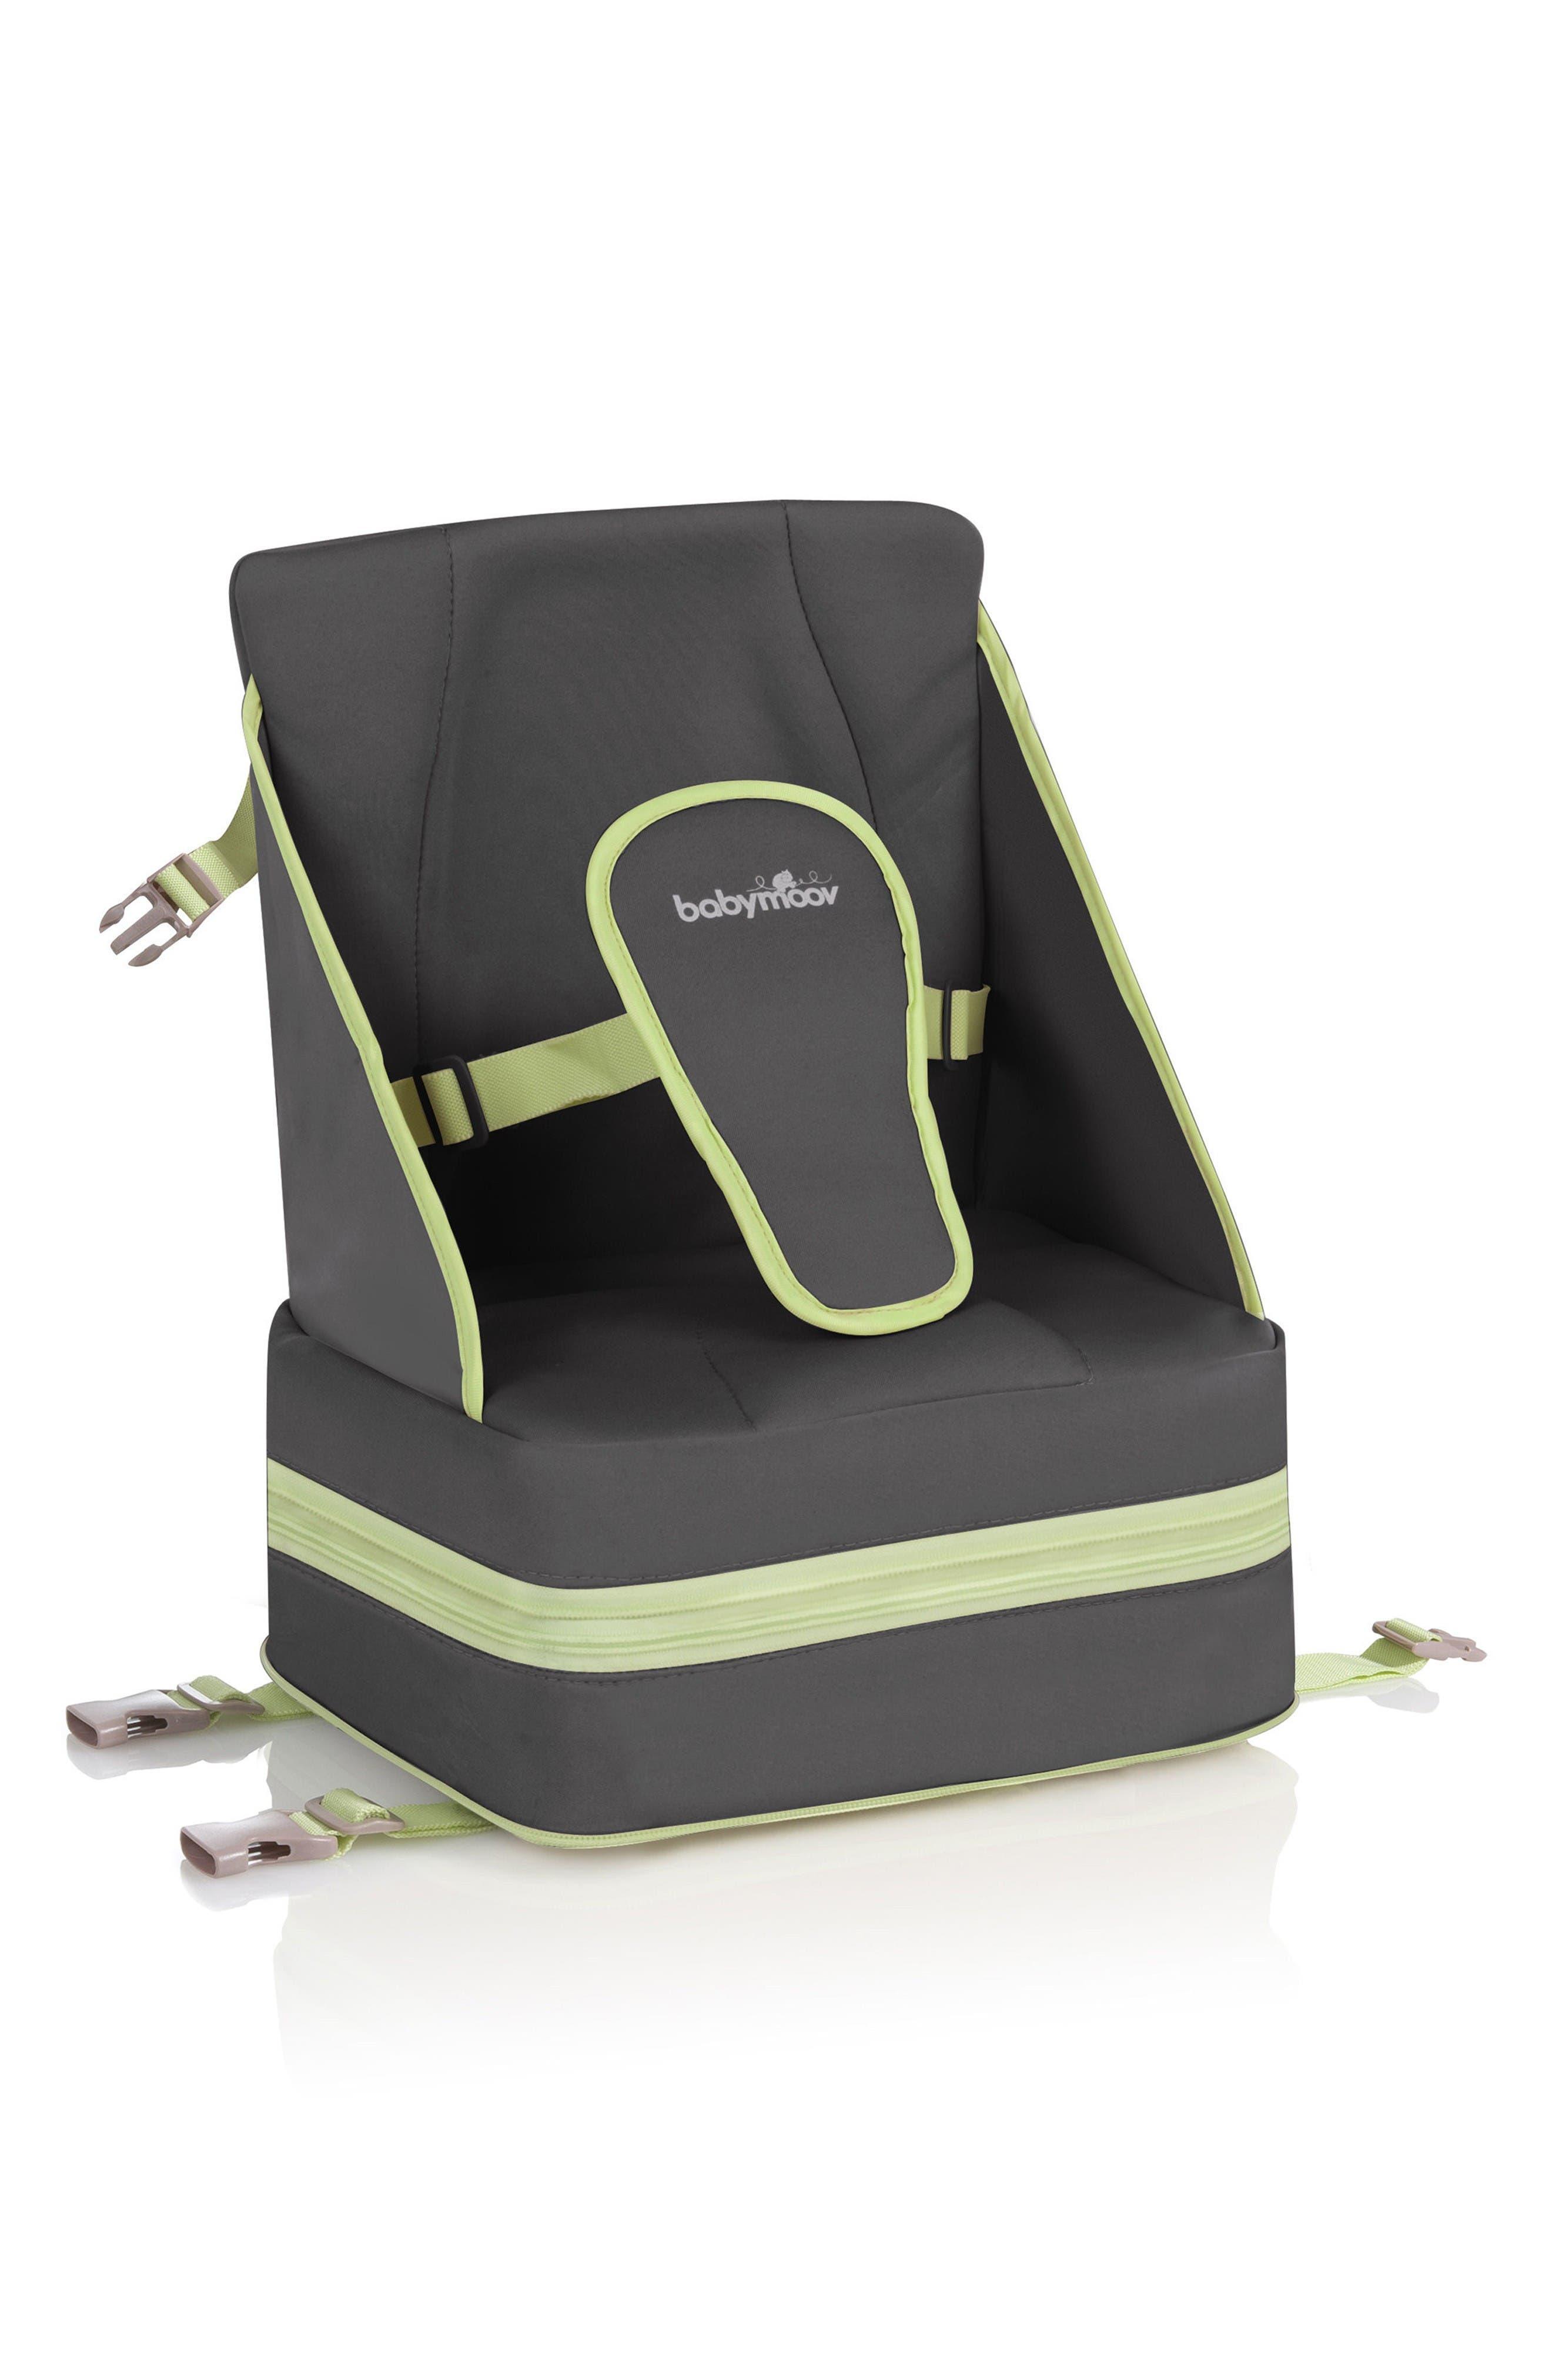 Alternate Image 1 Selected - Babymoov Up & Go Booster Seat